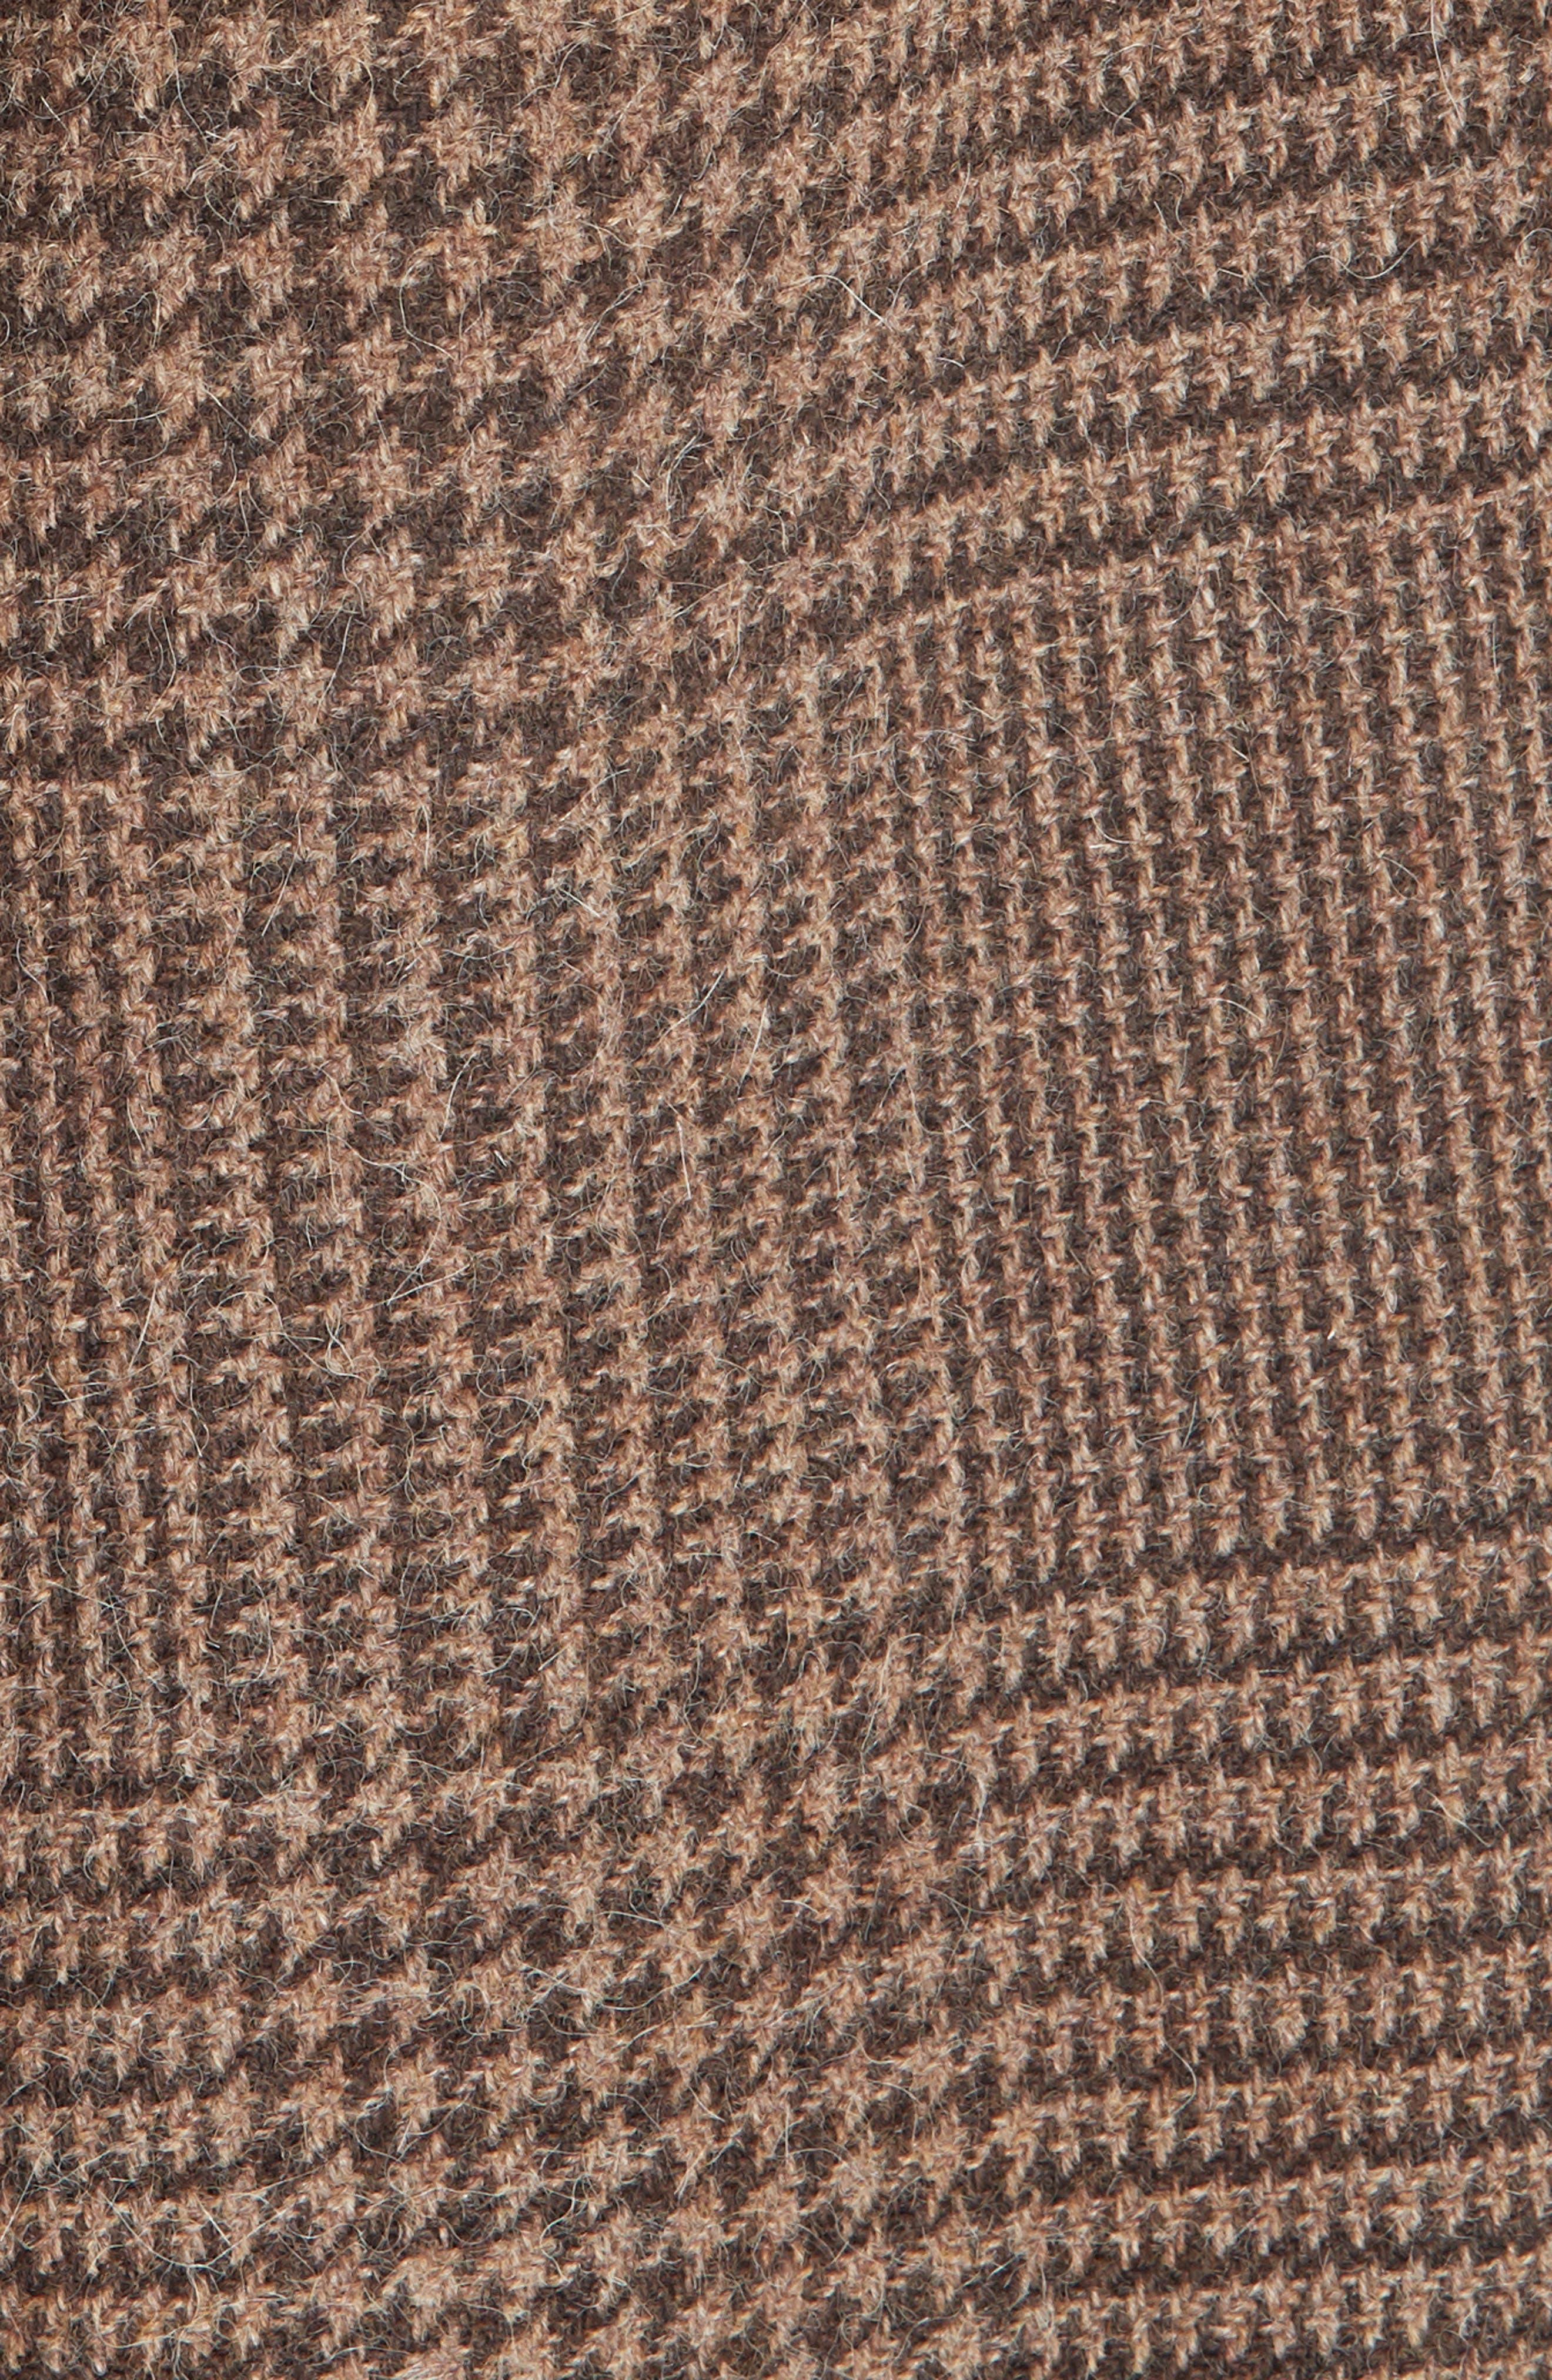 Plaid Lambswool & Alpaca Belted Coat,                             Alternate thumbnail 6, color,                             BROWN GLEN PLAID